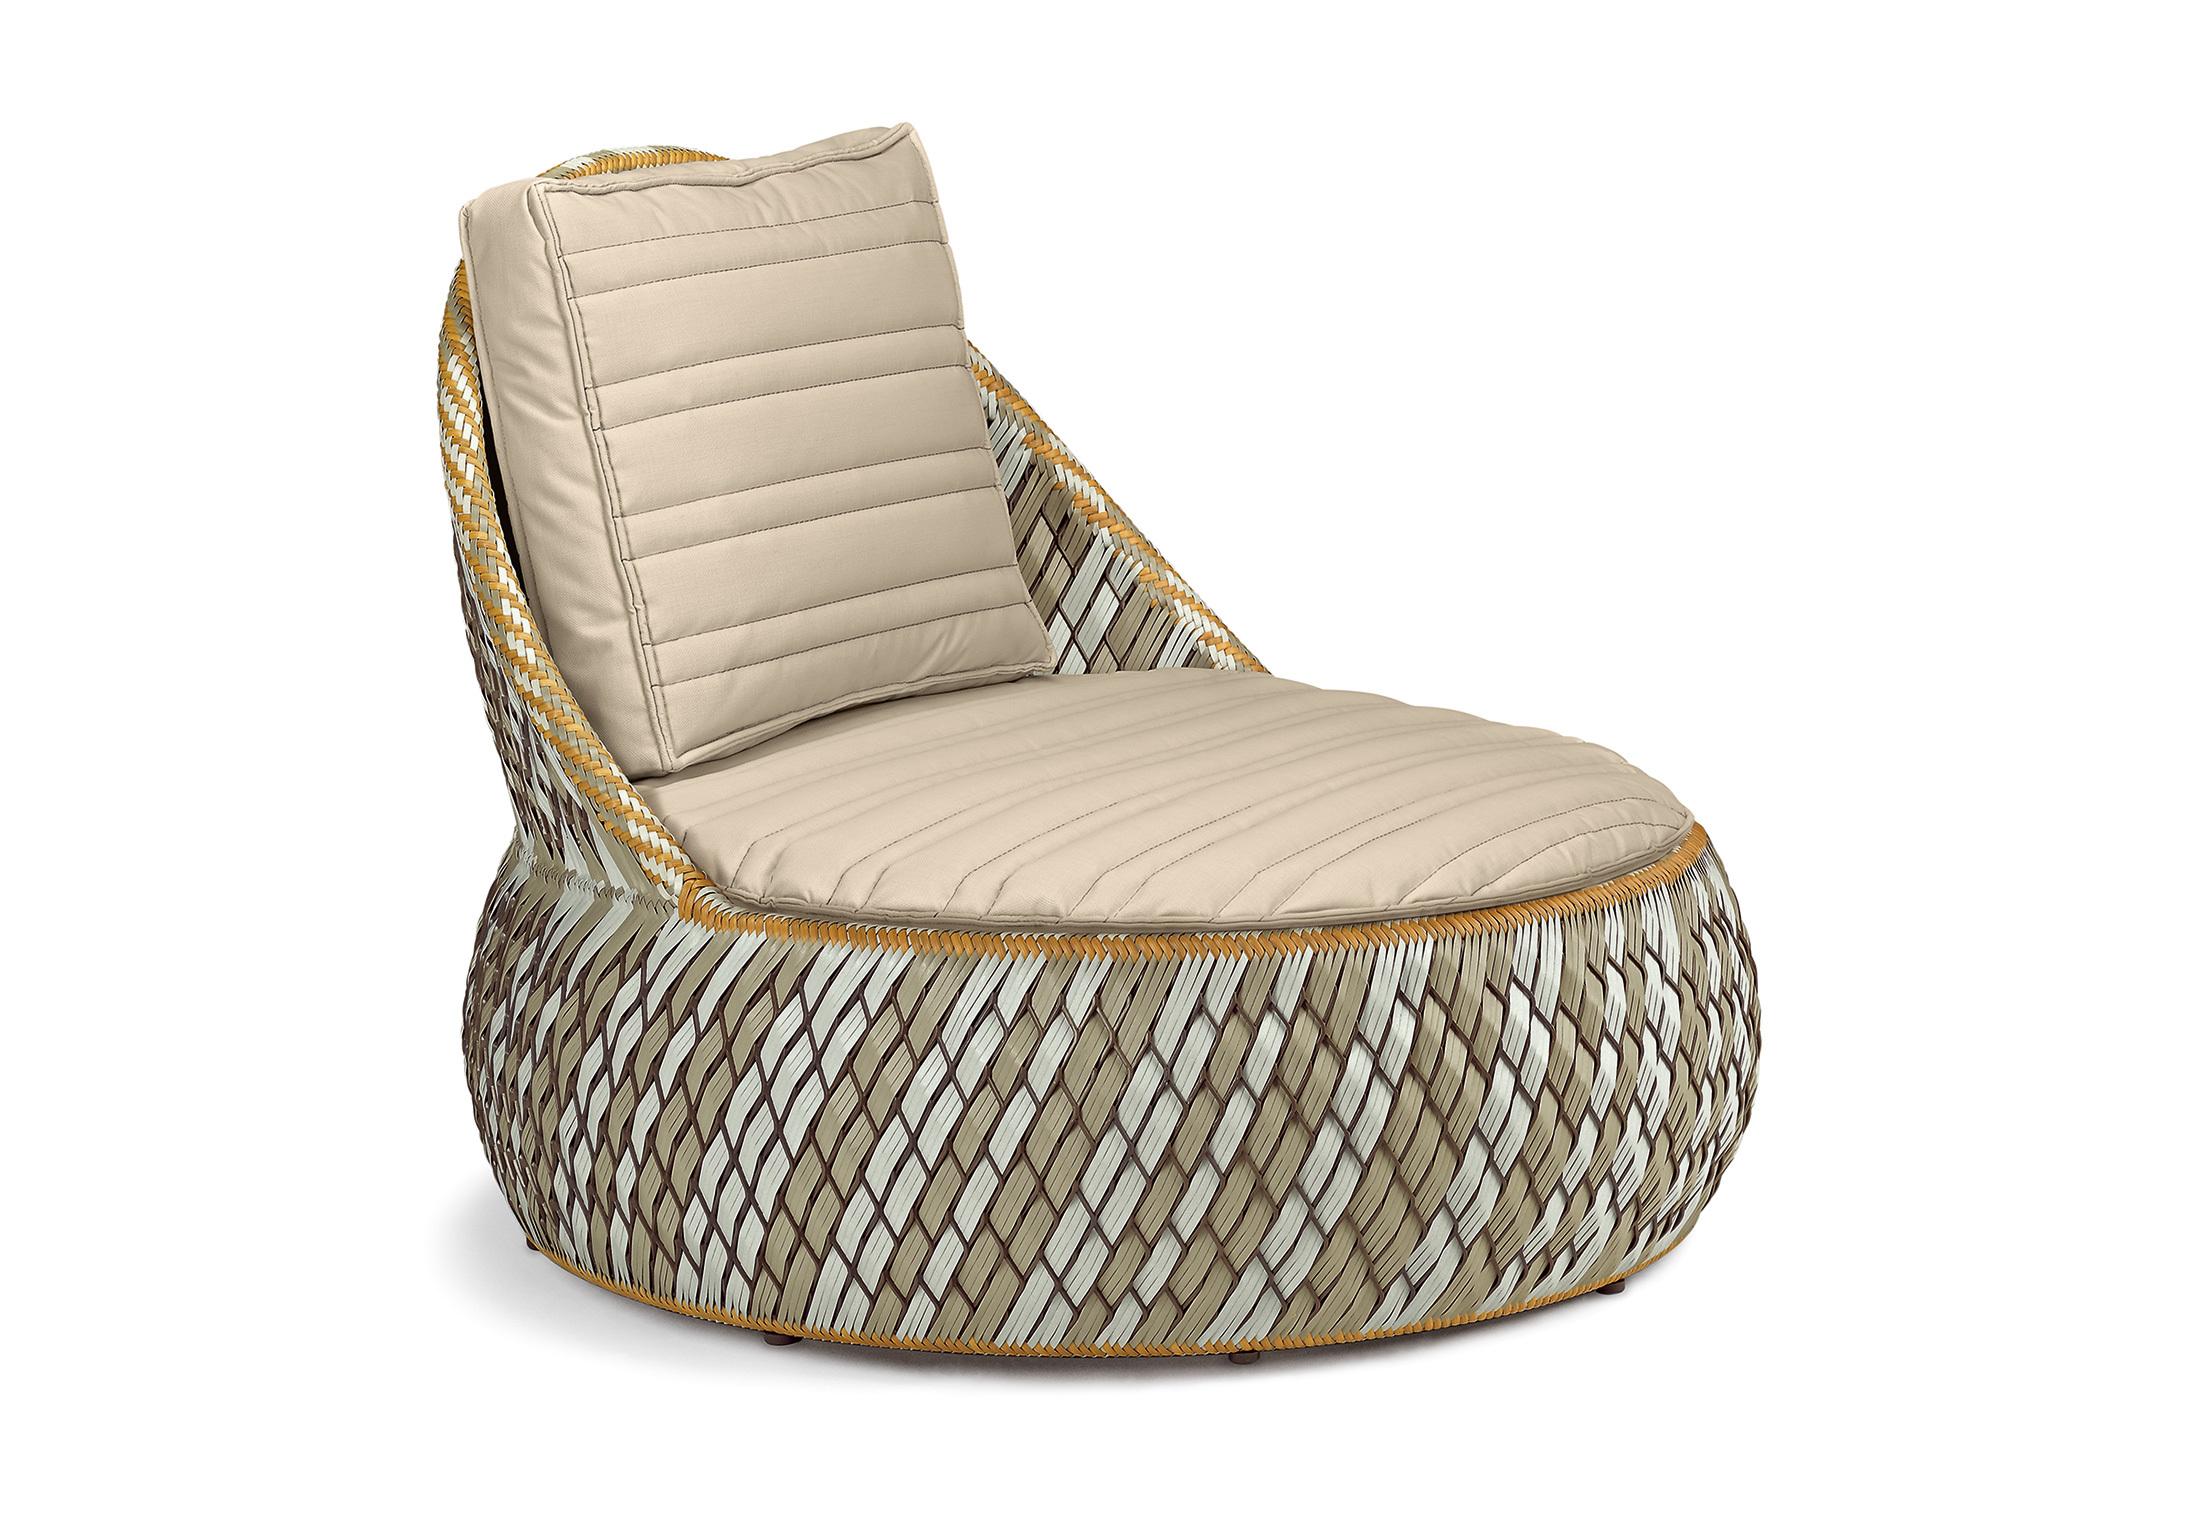 Magnificent Dala Lounge Chair By Dedon Stylepark Machost Co Dining Chair Design Ideas Machostcouk